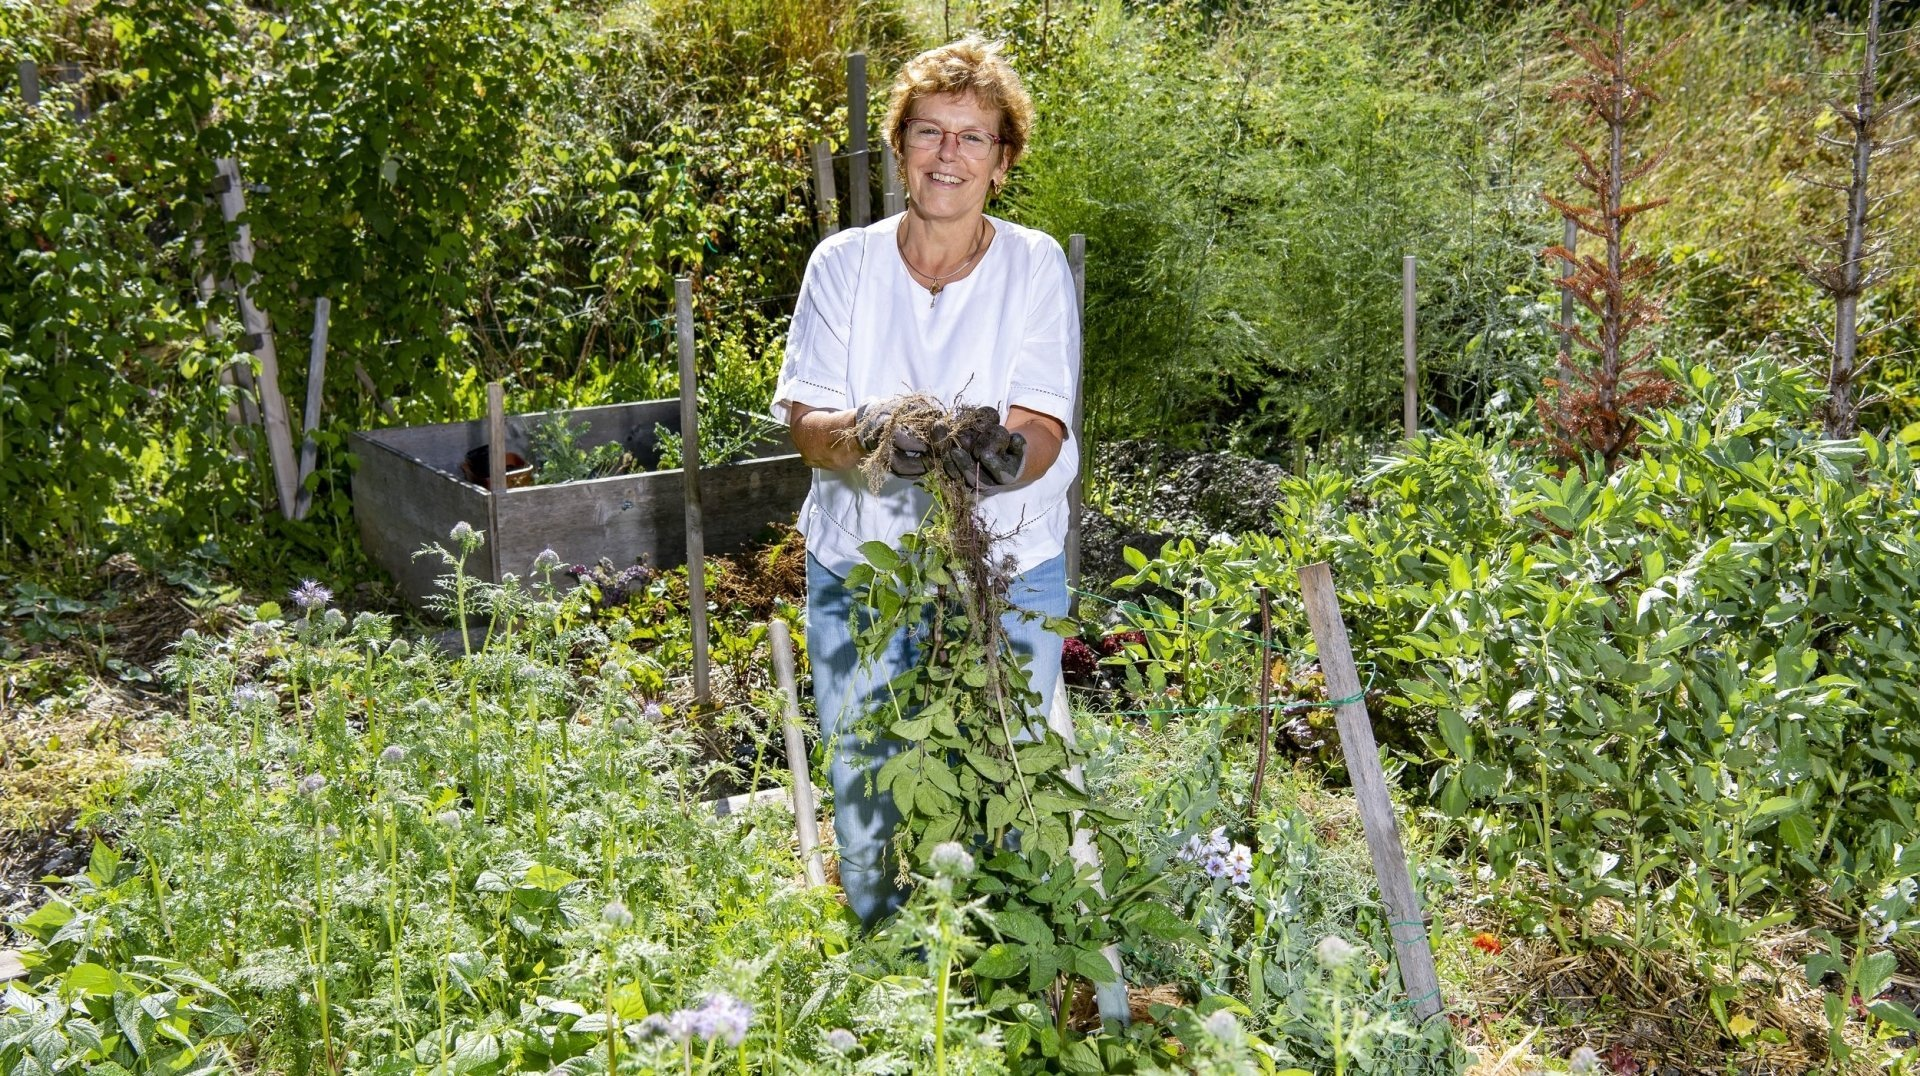 Une Evolénarde cultive l'art de jardiner sans jamais cesser de s'émerveiller